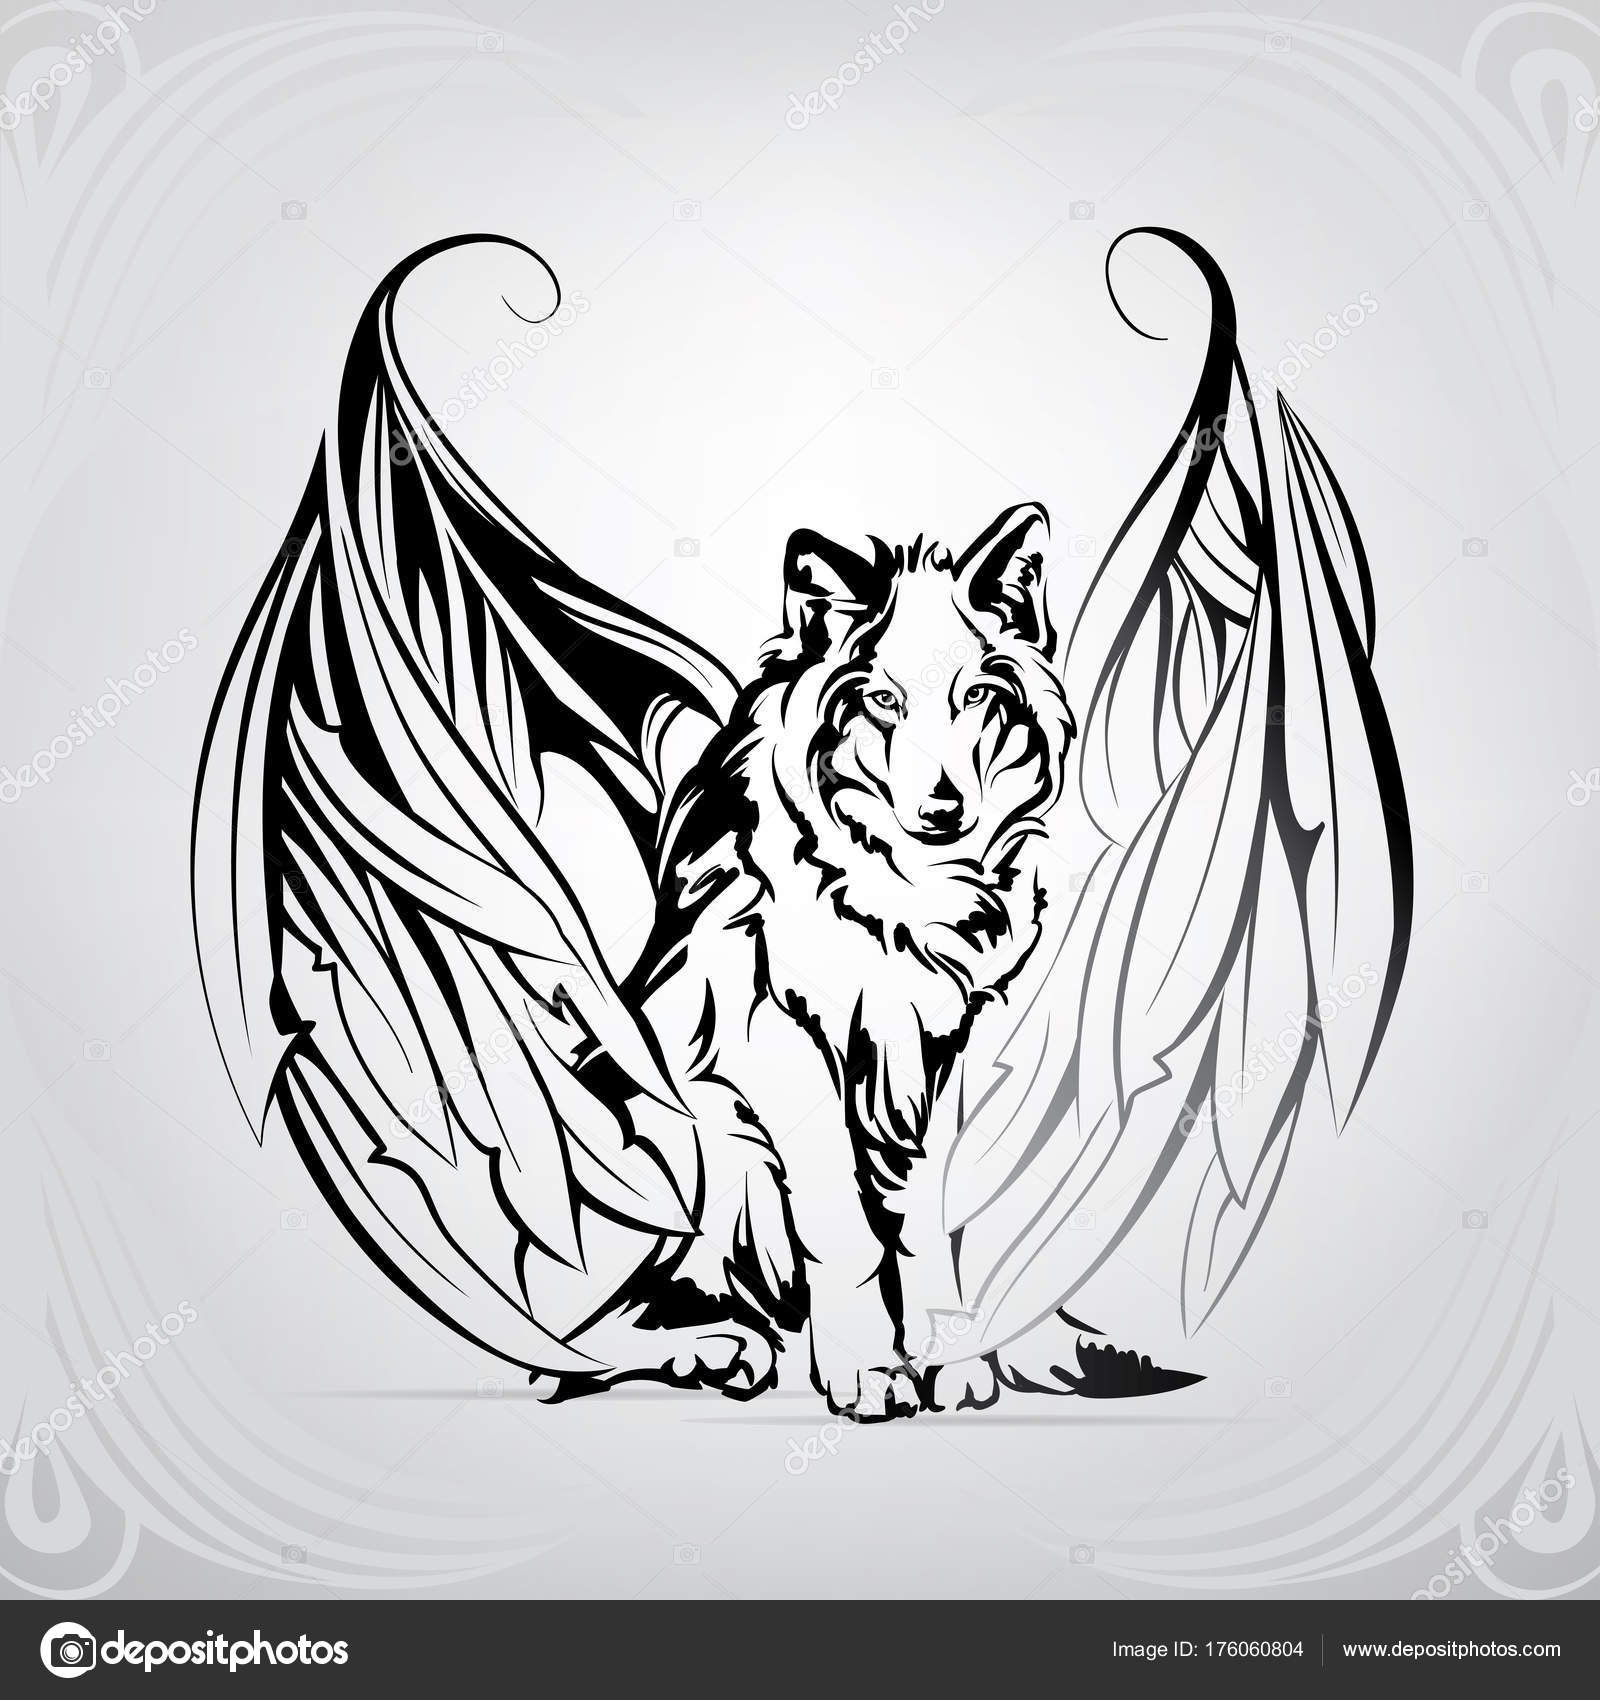 Imágenes Siluetas De Lobos Para Dibujar Silueta Lobo Con Alas